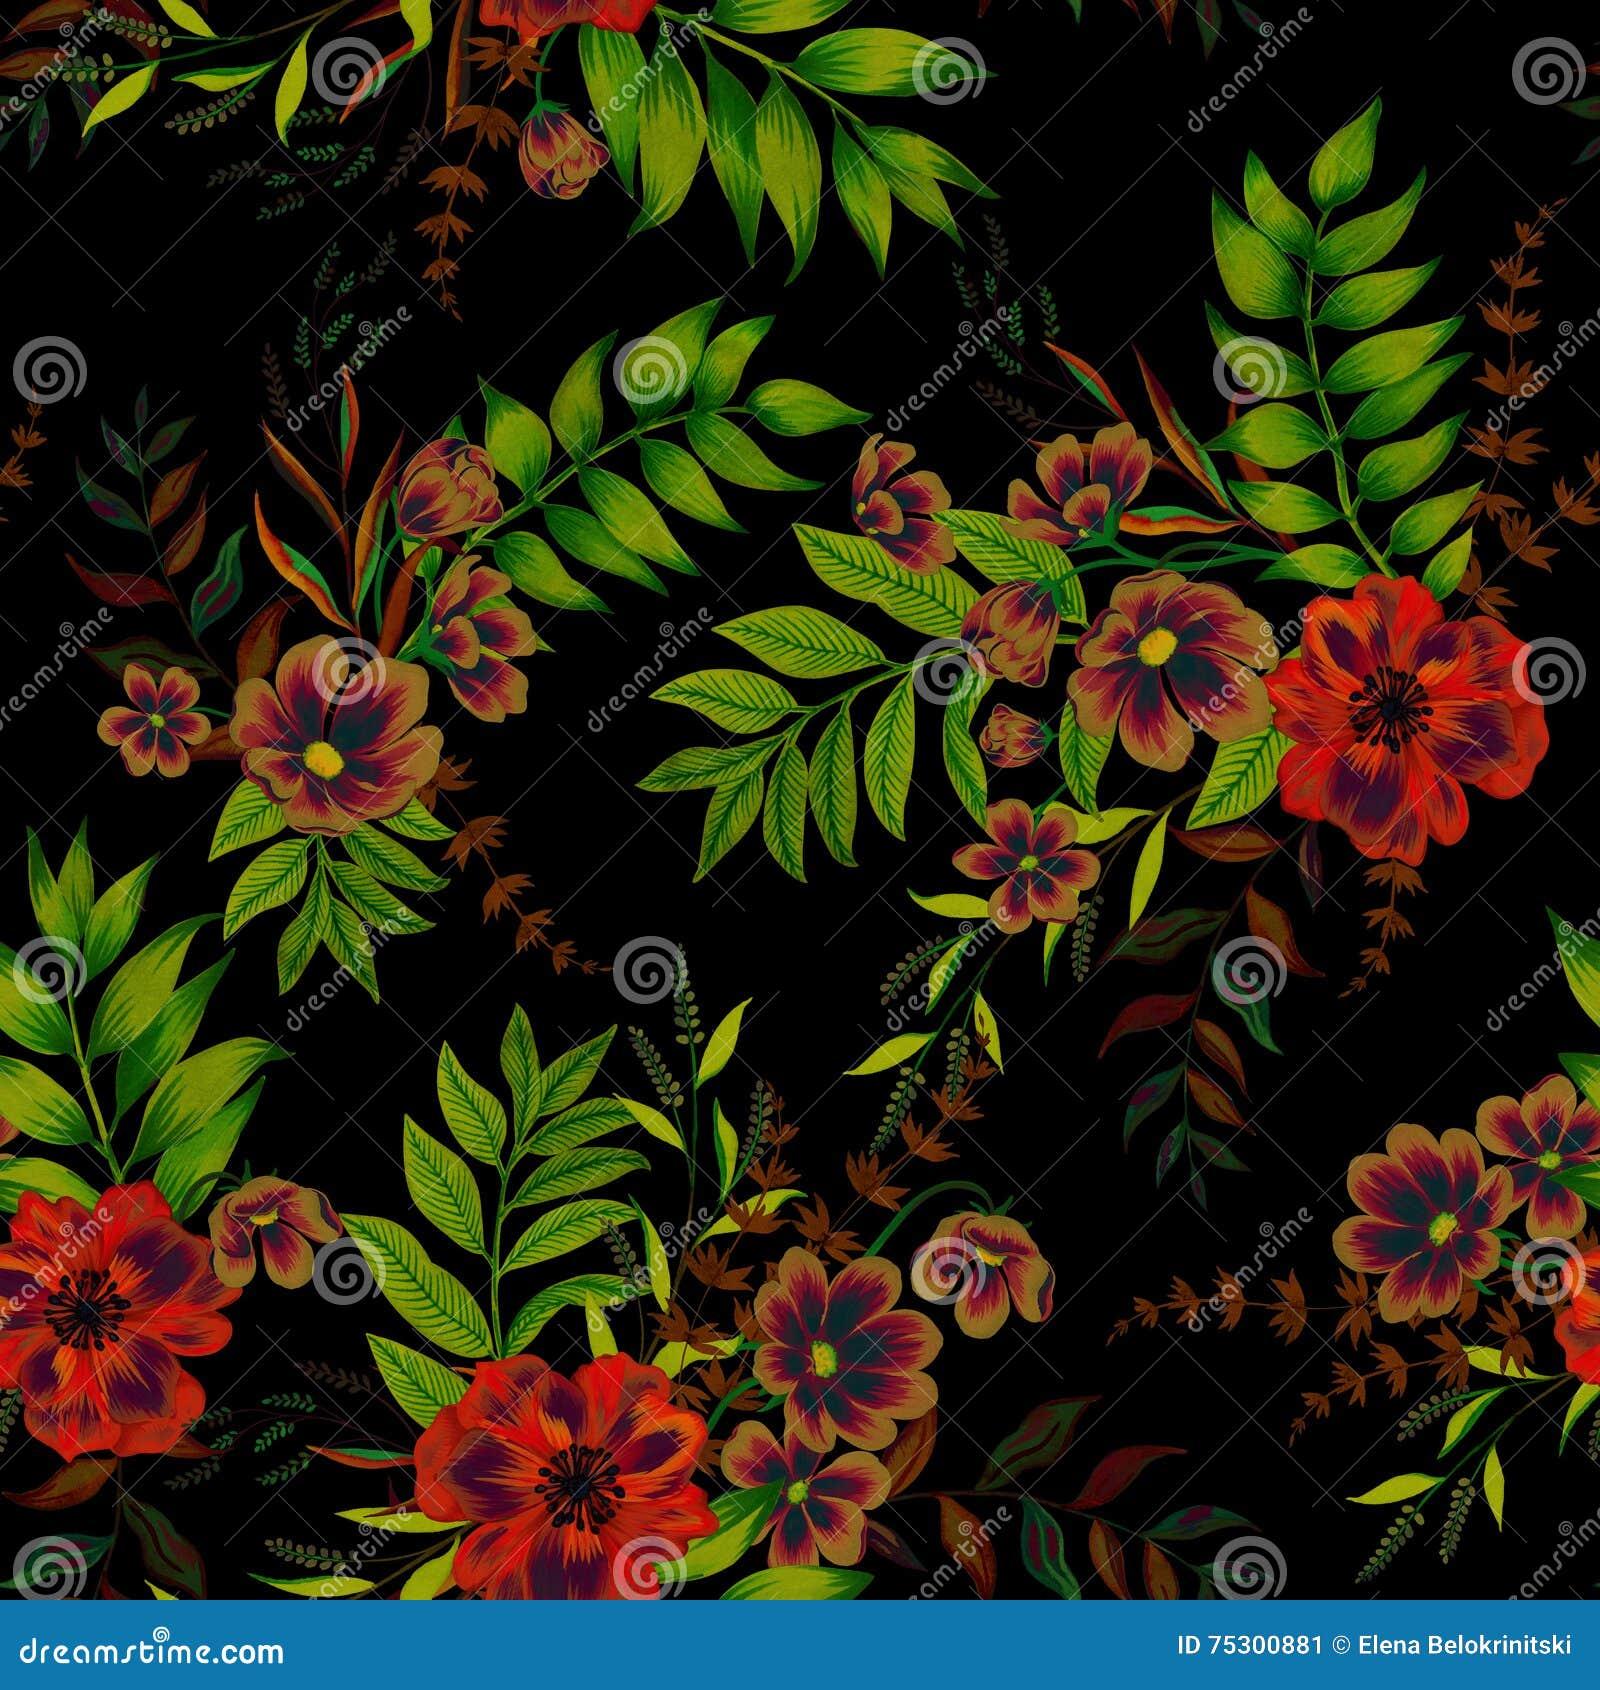 15 Most Beautiful Black Flowers: Flowers On Black Pattern Stock Illustration